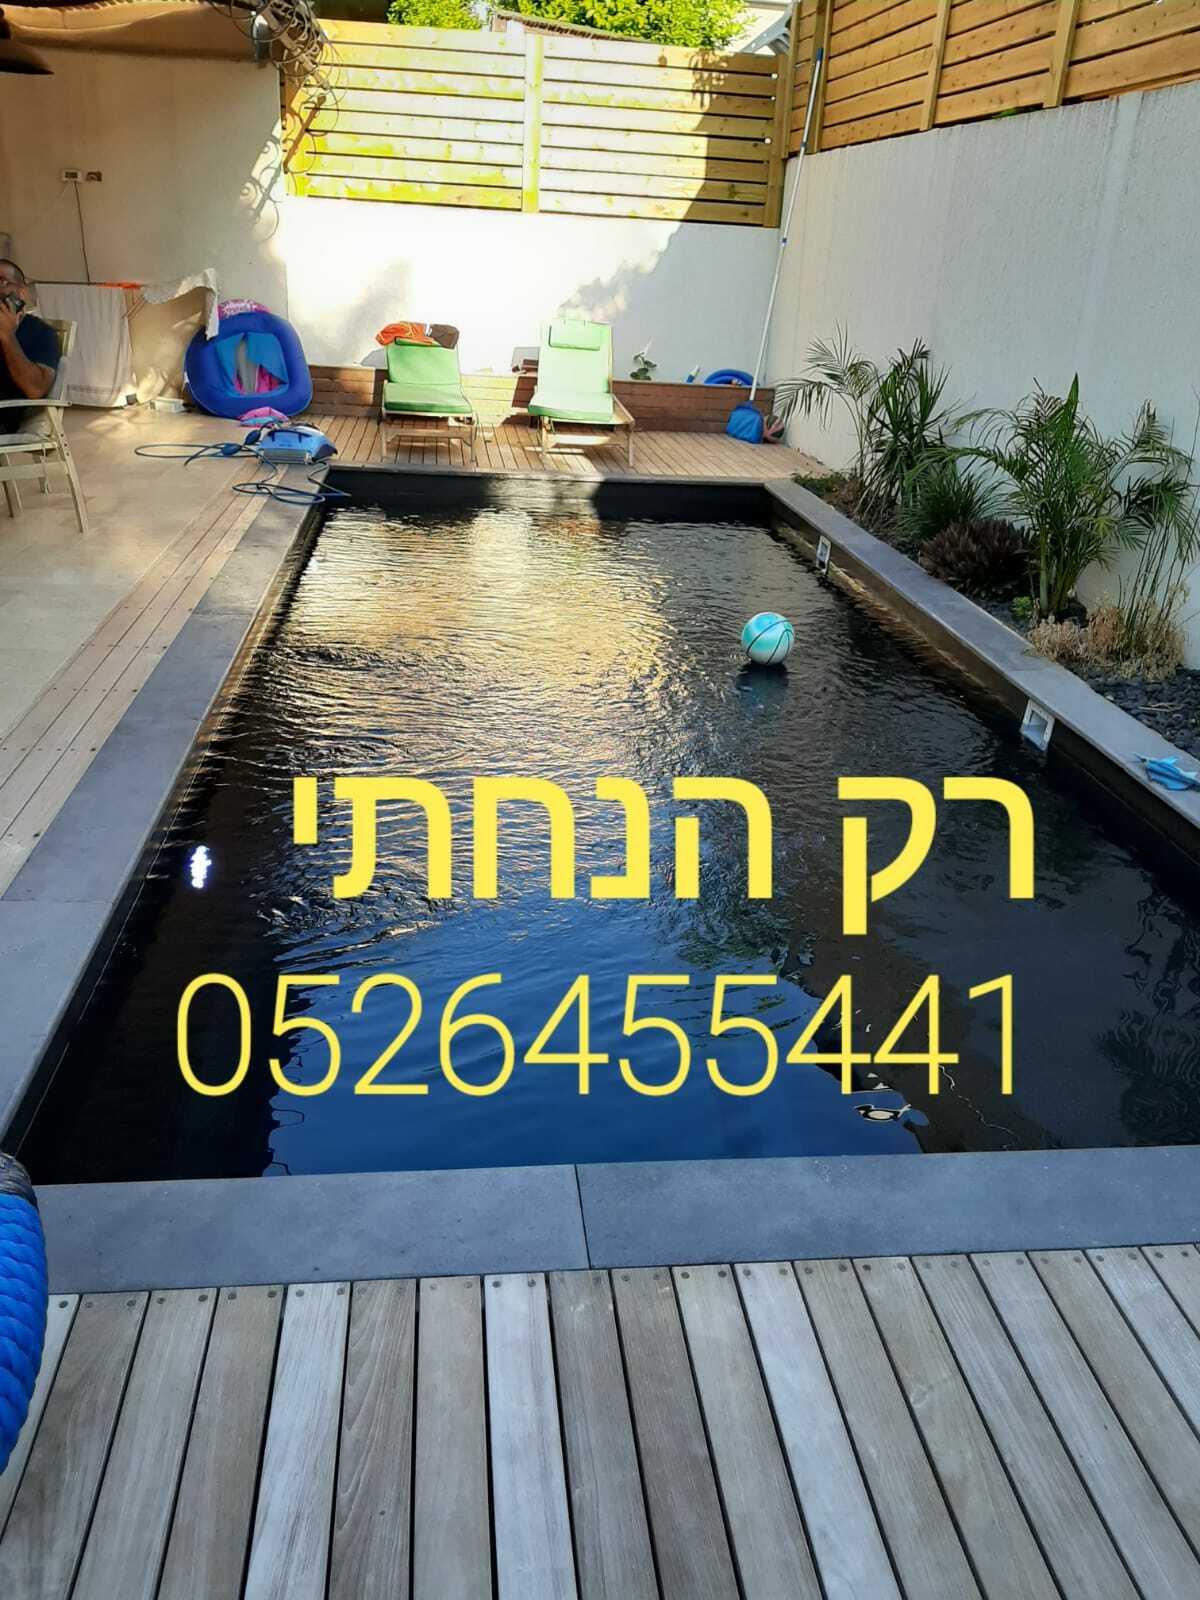 fiberglass4u בריכות שחייה